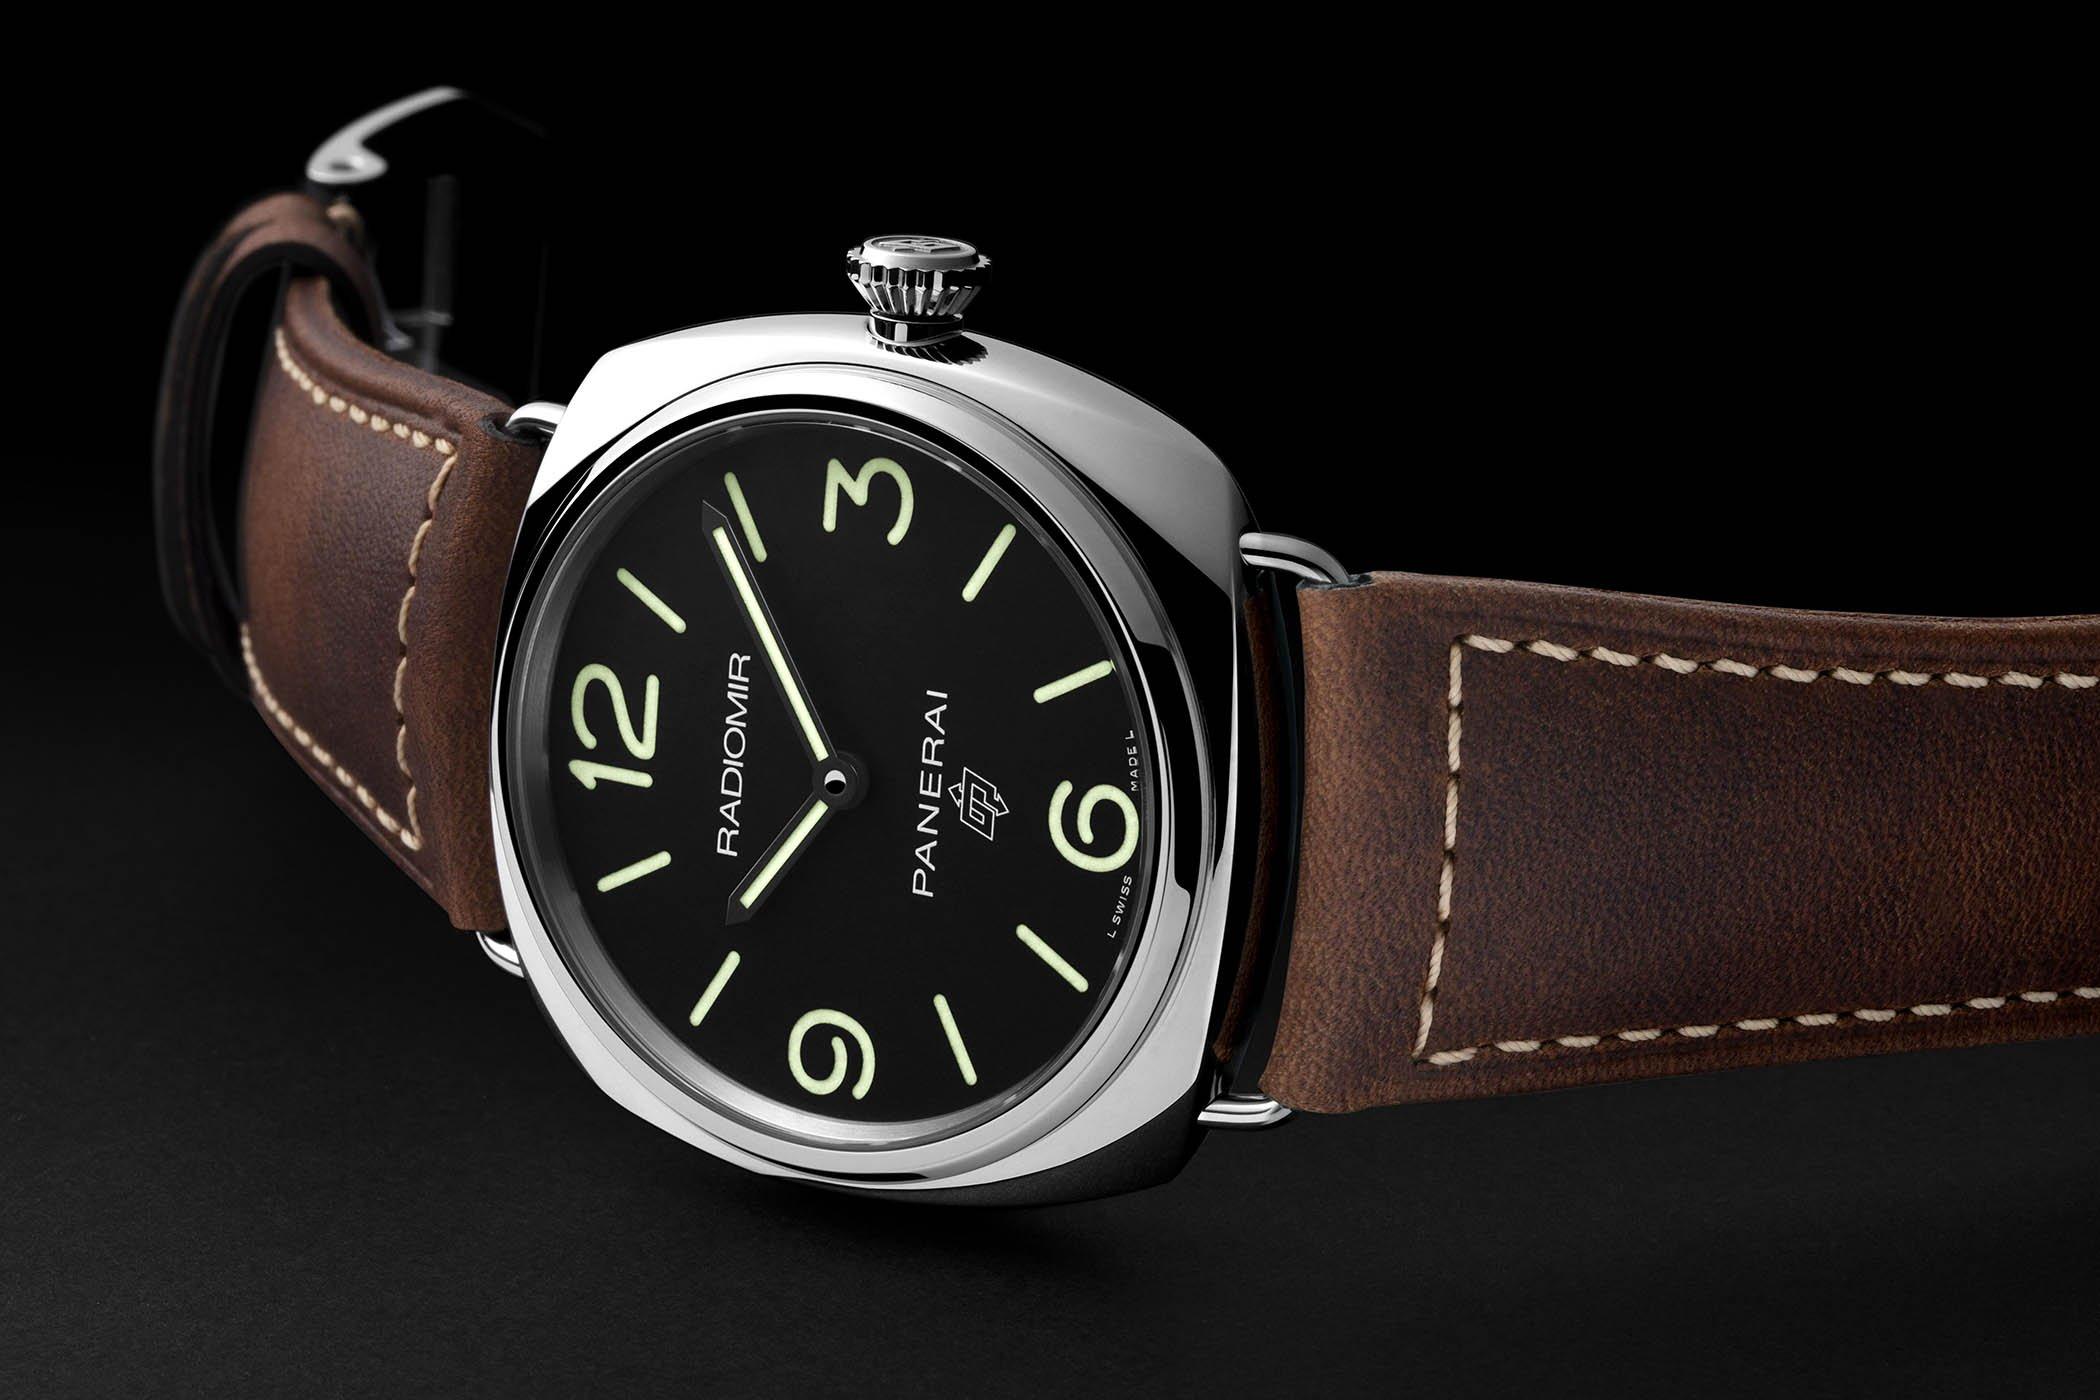 entry-level Panerai watch men's luxury watch